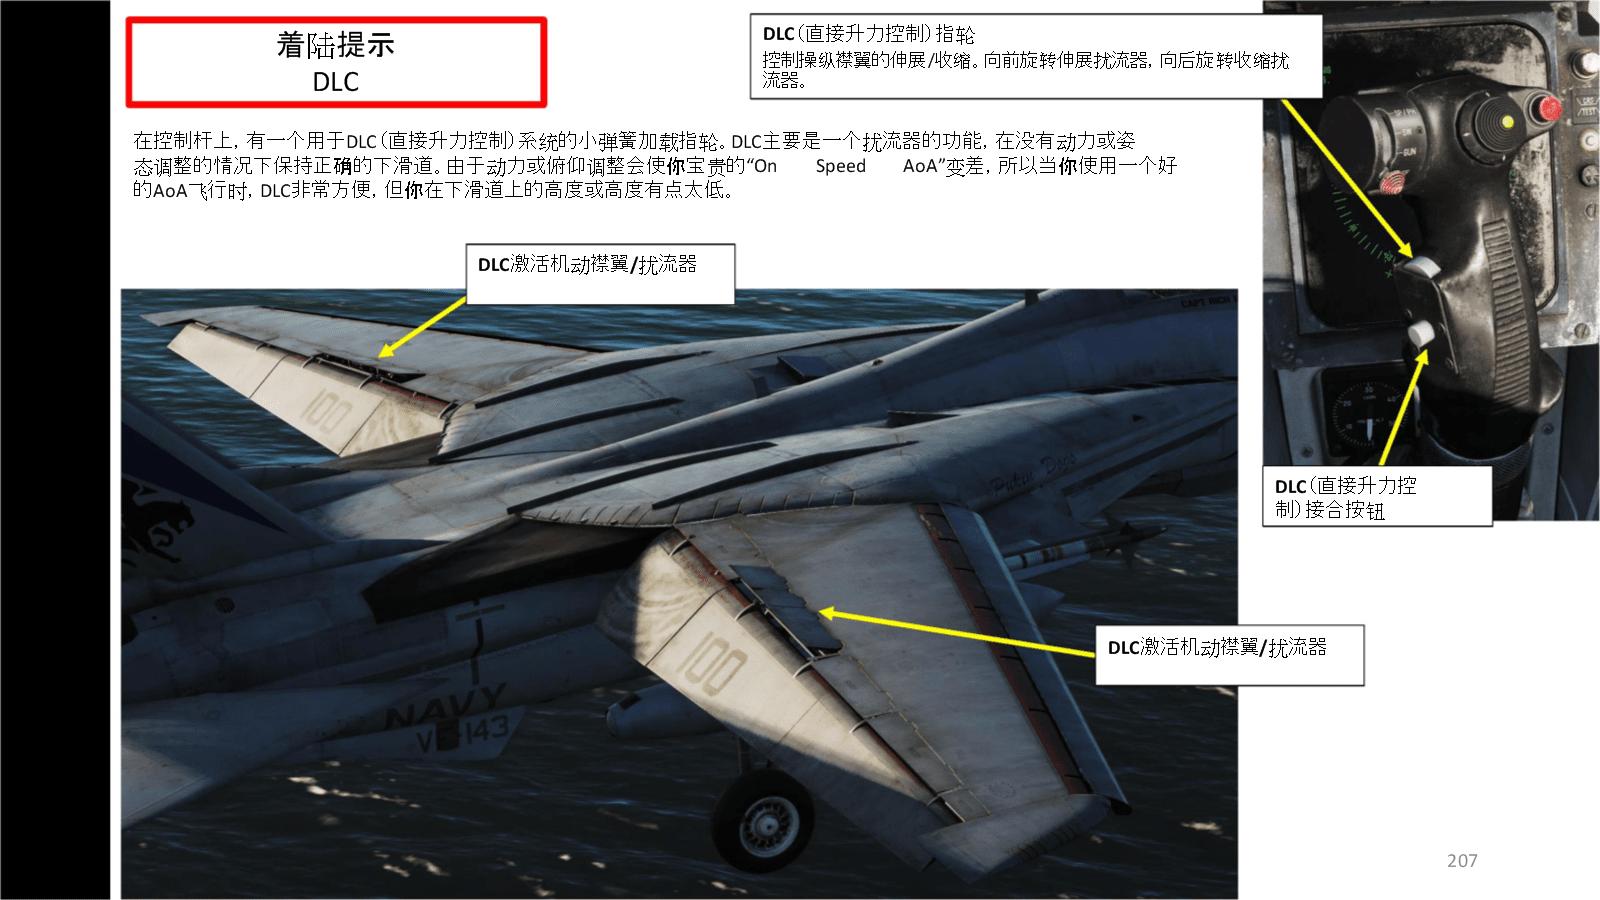 DCS F 14B Tomcat雄猫战斗机 中文指南 6.3着陆提示DLC.docx